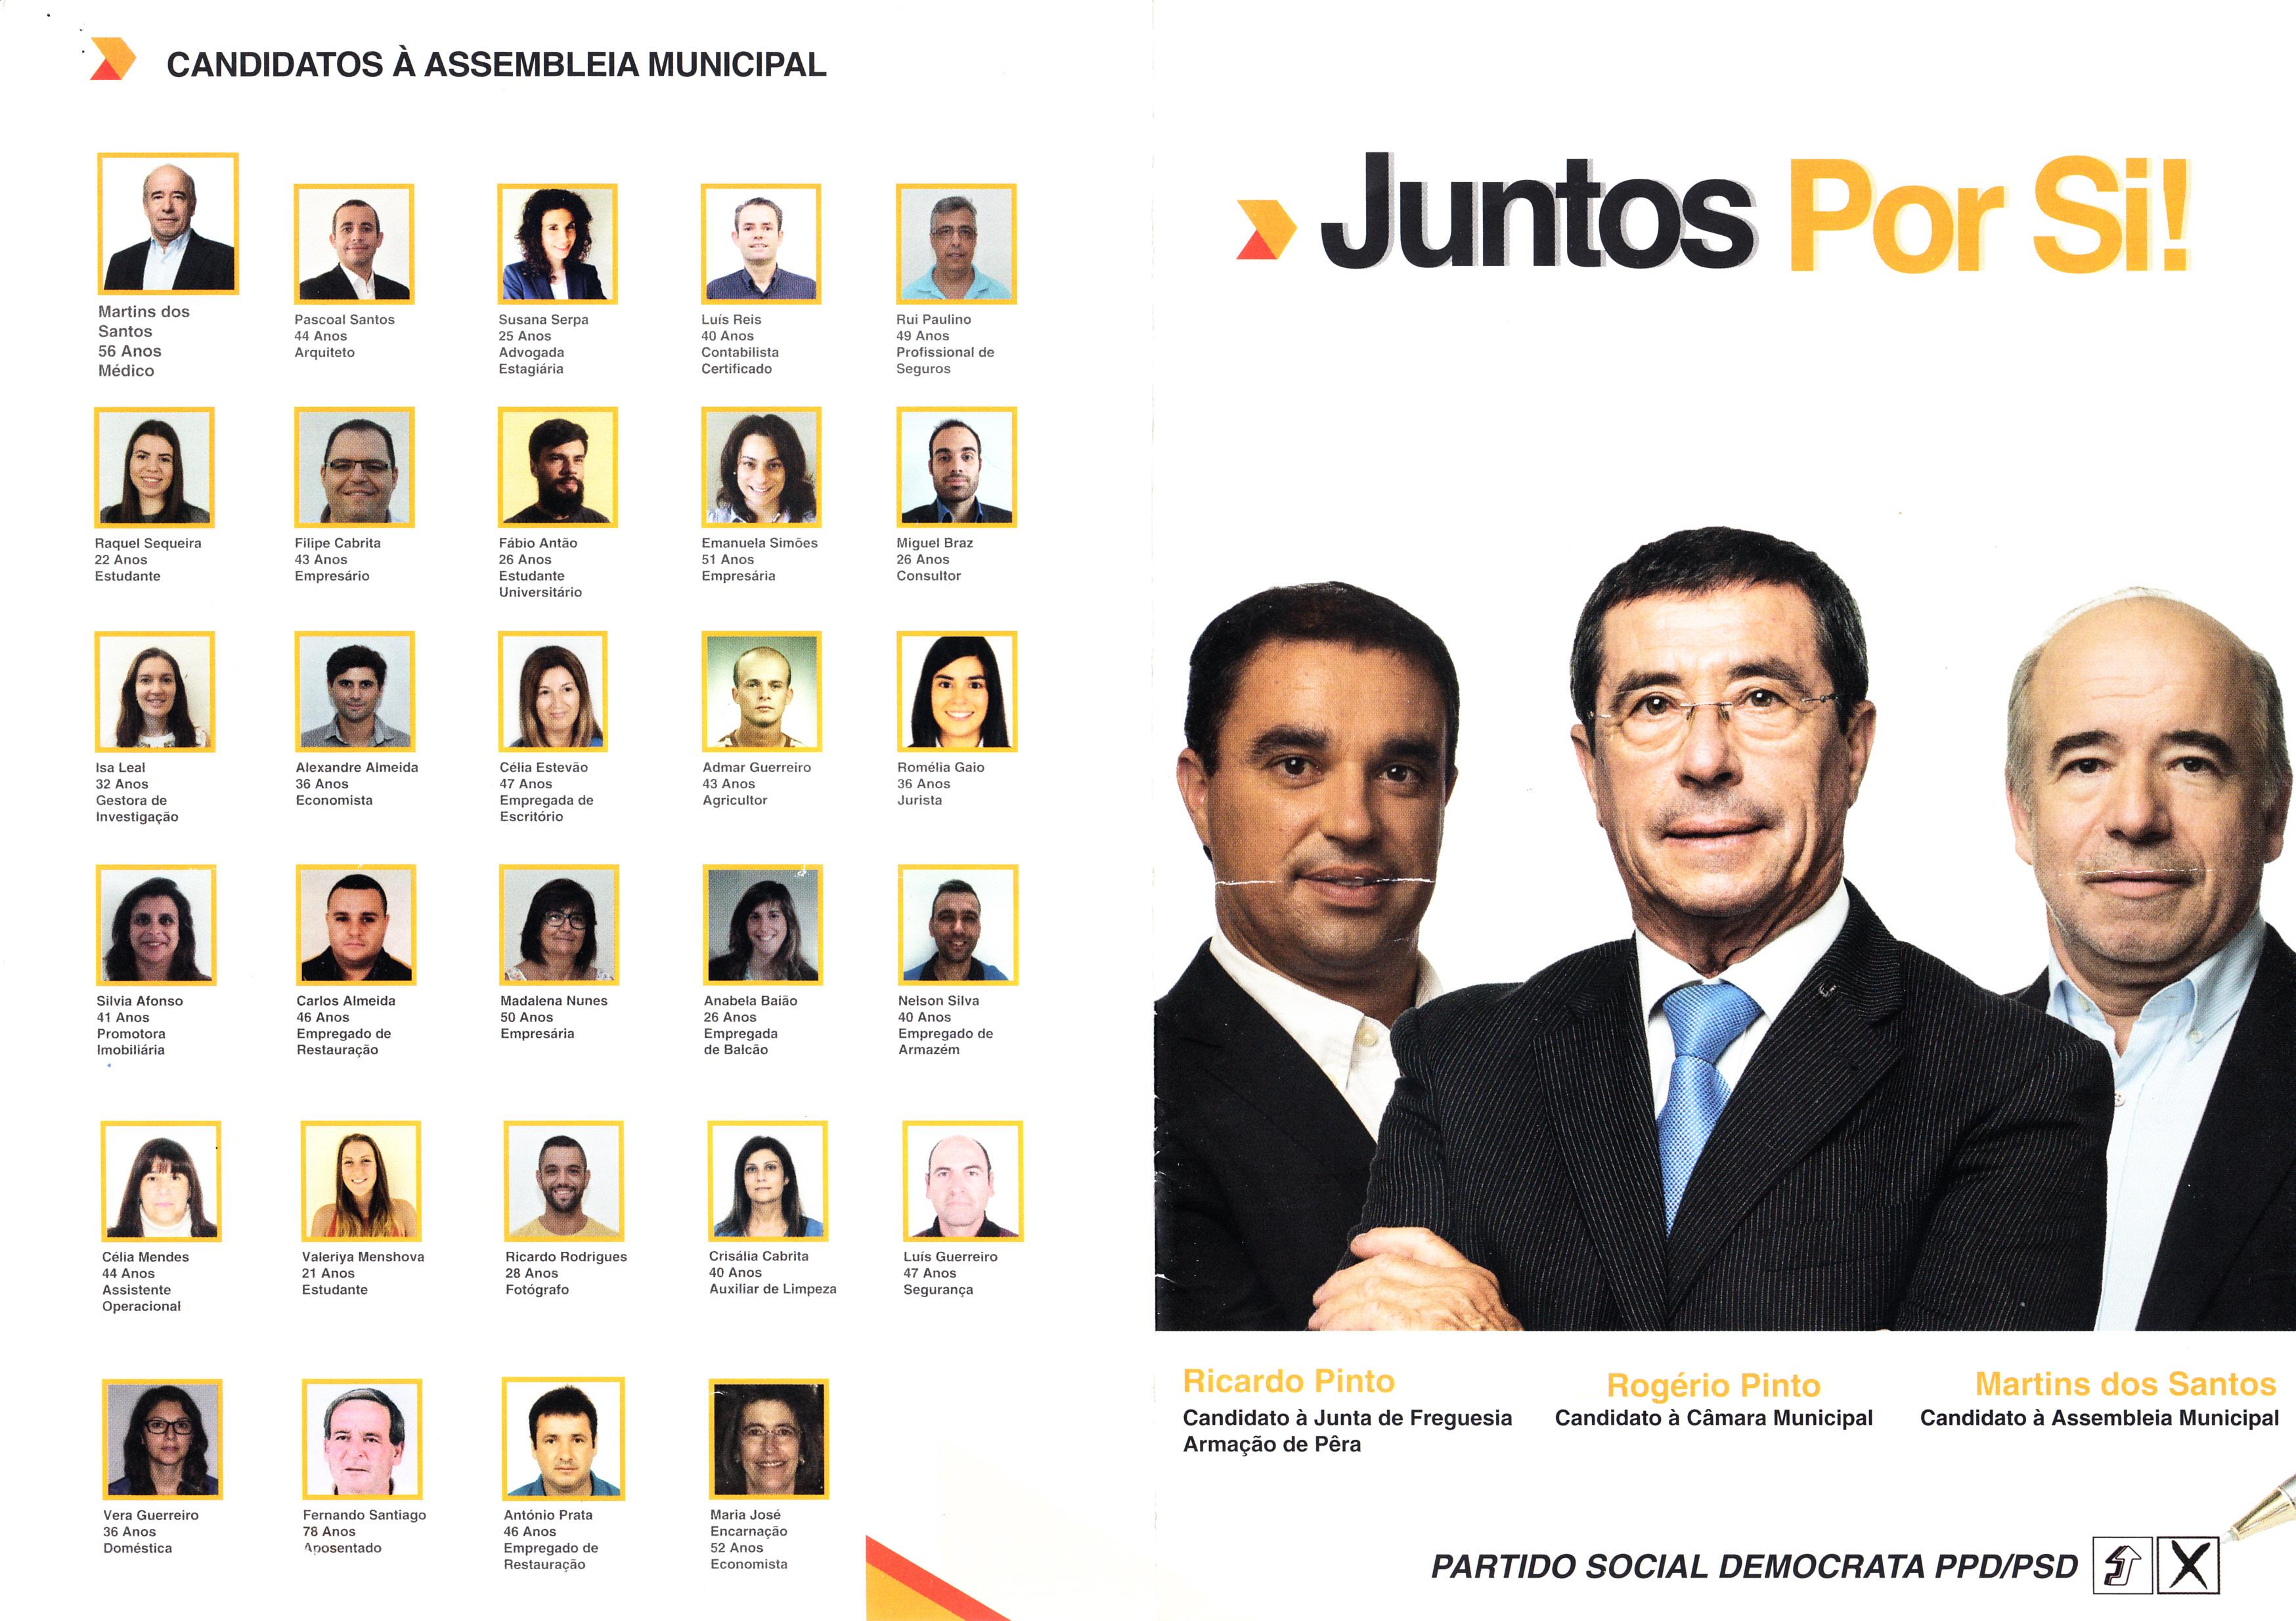 PSD_2017_Armacao Pera_0001